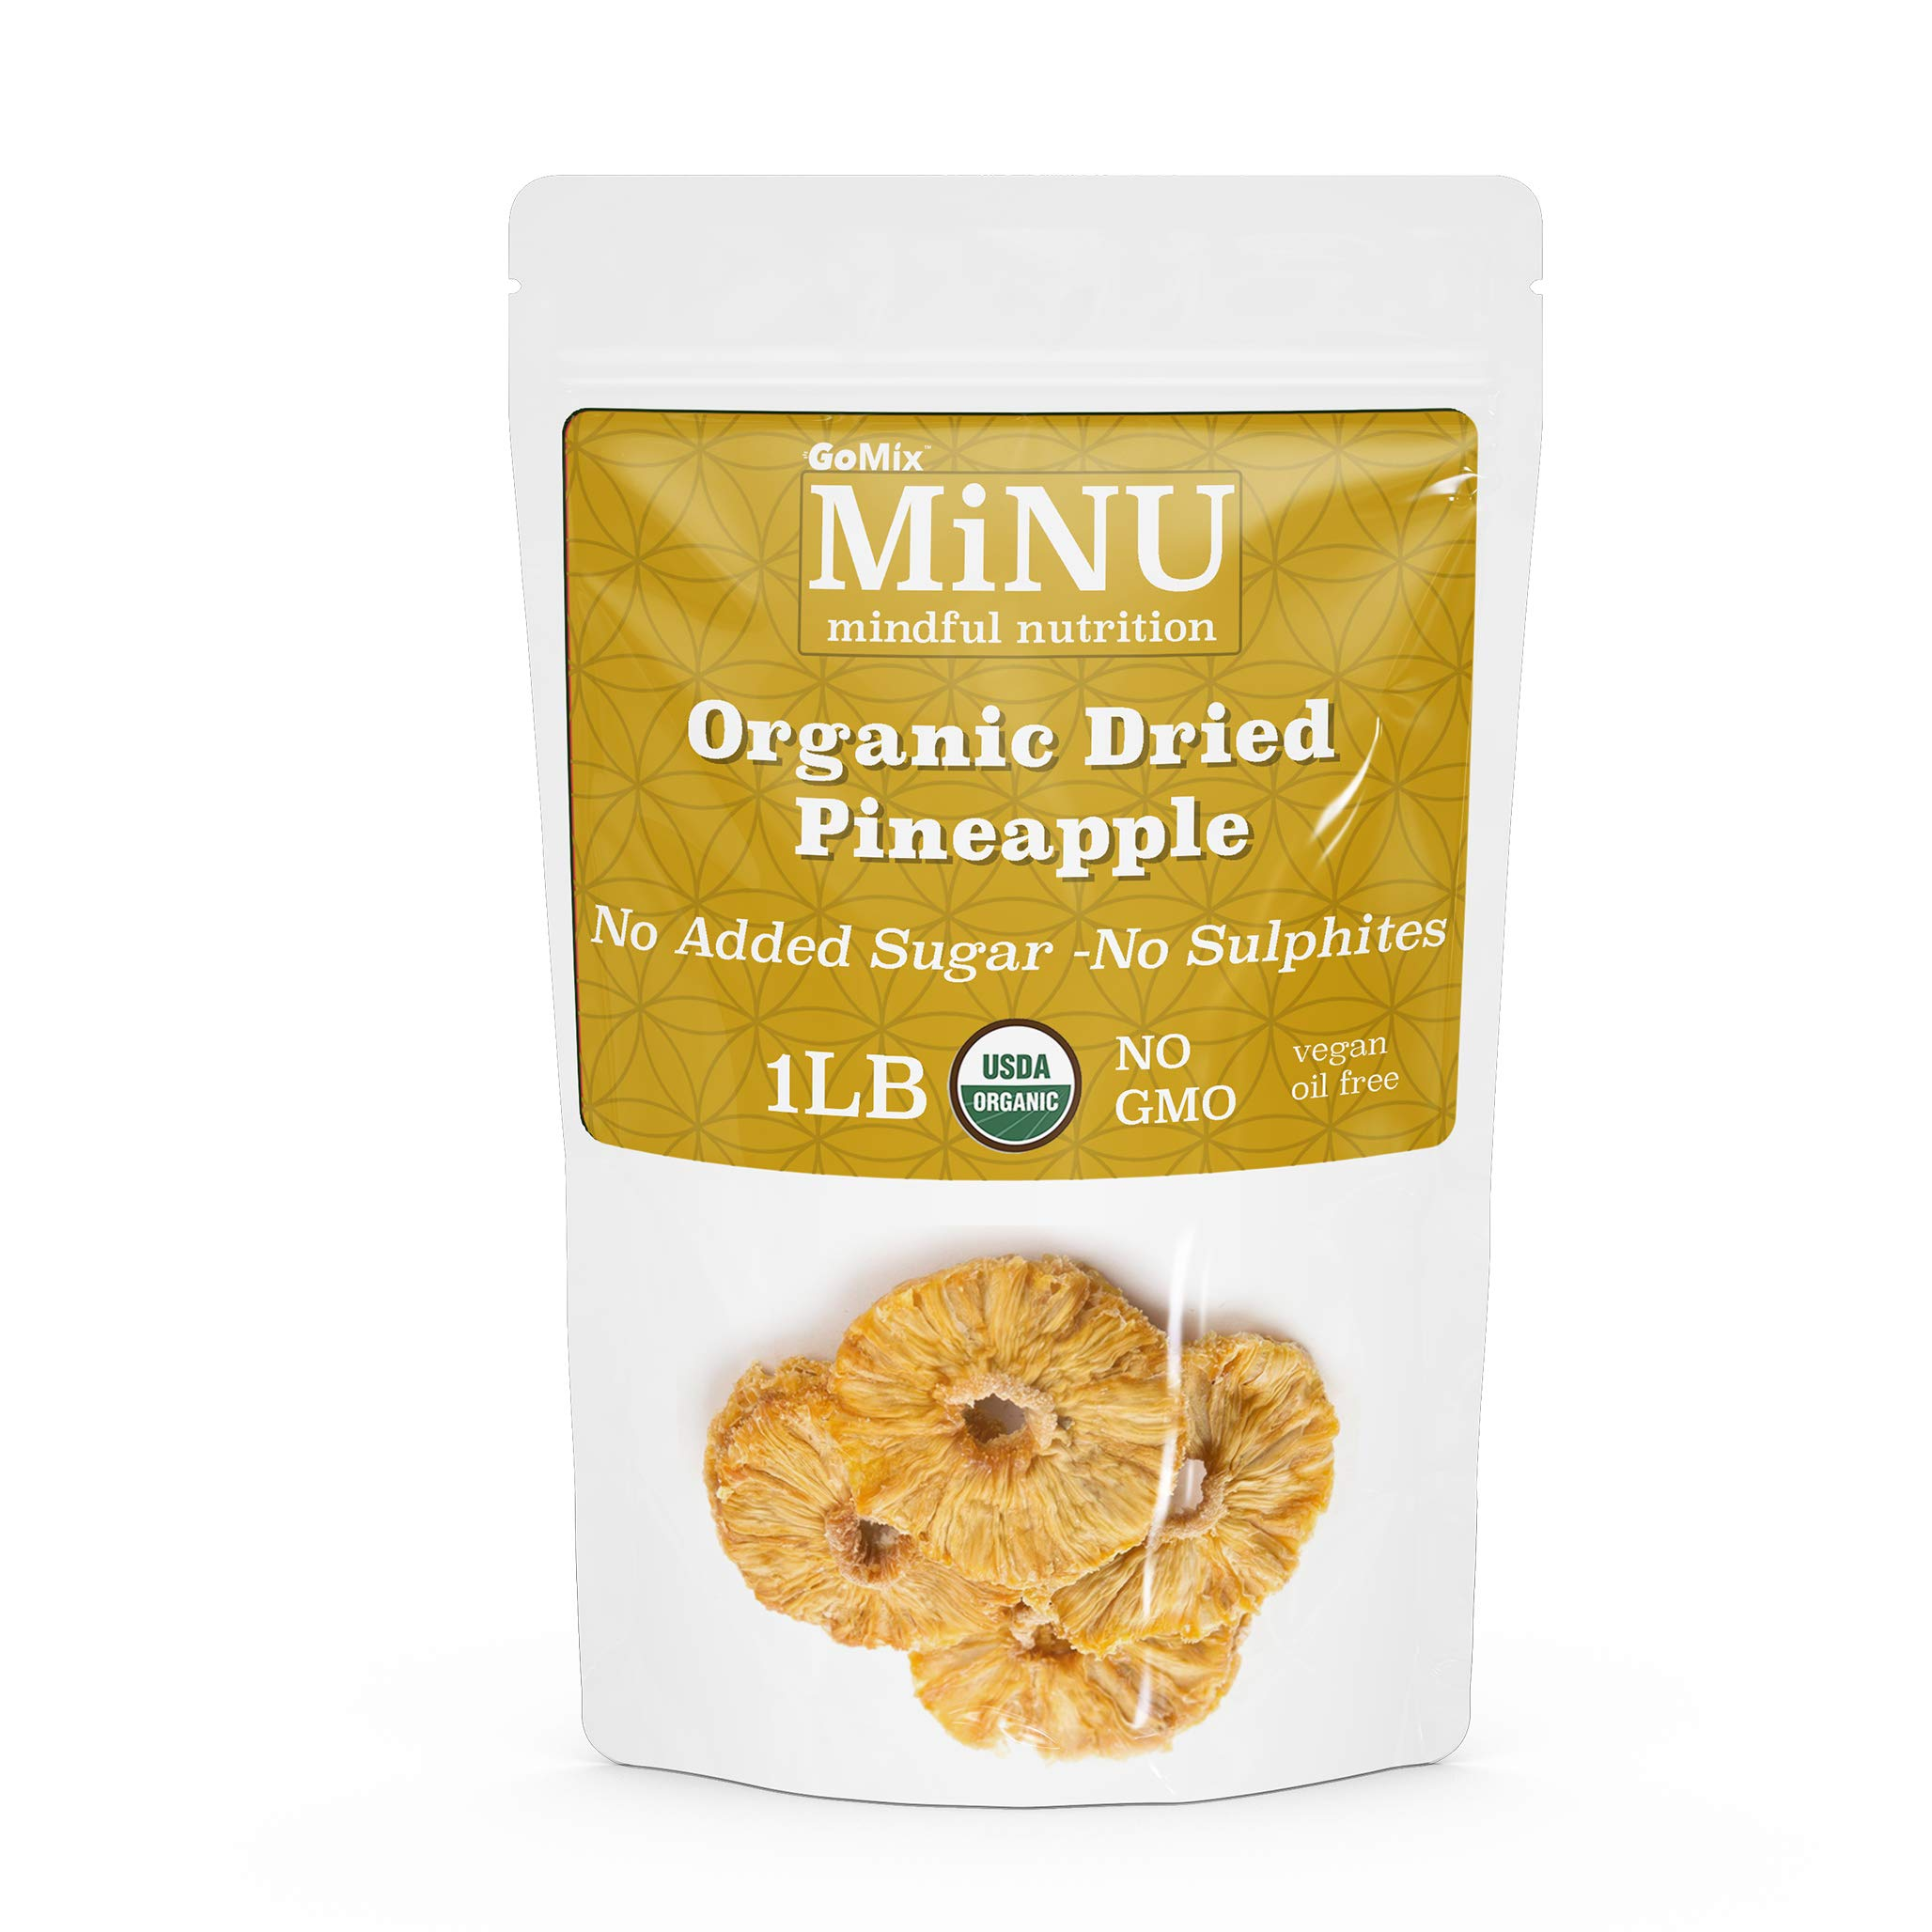 GoMix Organic Dried Pineapple 16 oz (1 lb), No Sulphur, No Added Sugar, MiNU Mindful Nutrition Superfood, Raw, Protein, Paleo, Keto, Vegan, NonGMO, Gluten Free No Nonsense! by GoMix